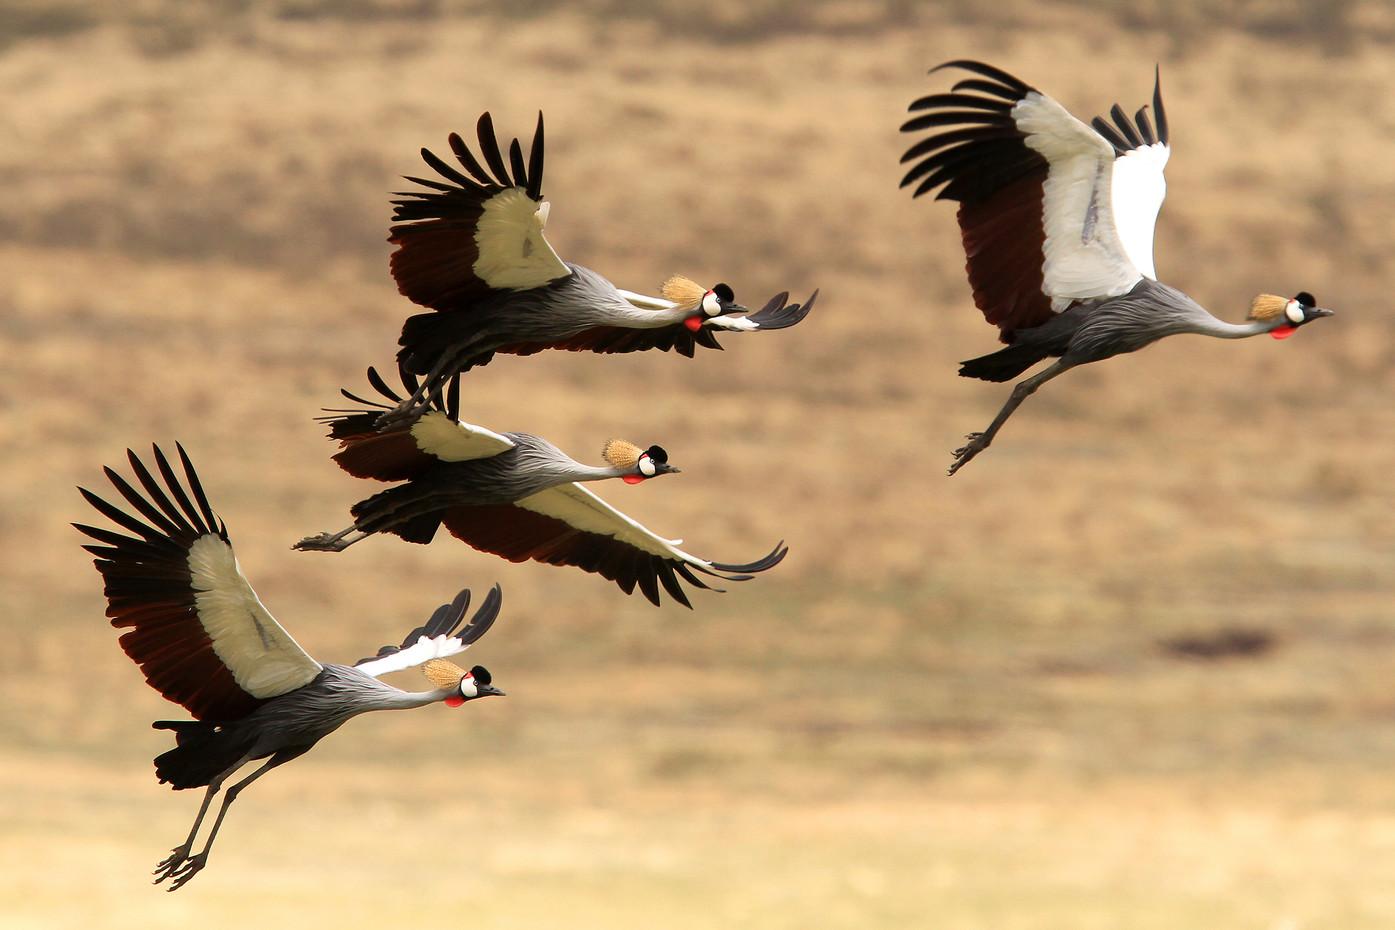 Crowned Cranes in Ngorongoro Crater, Tanzania